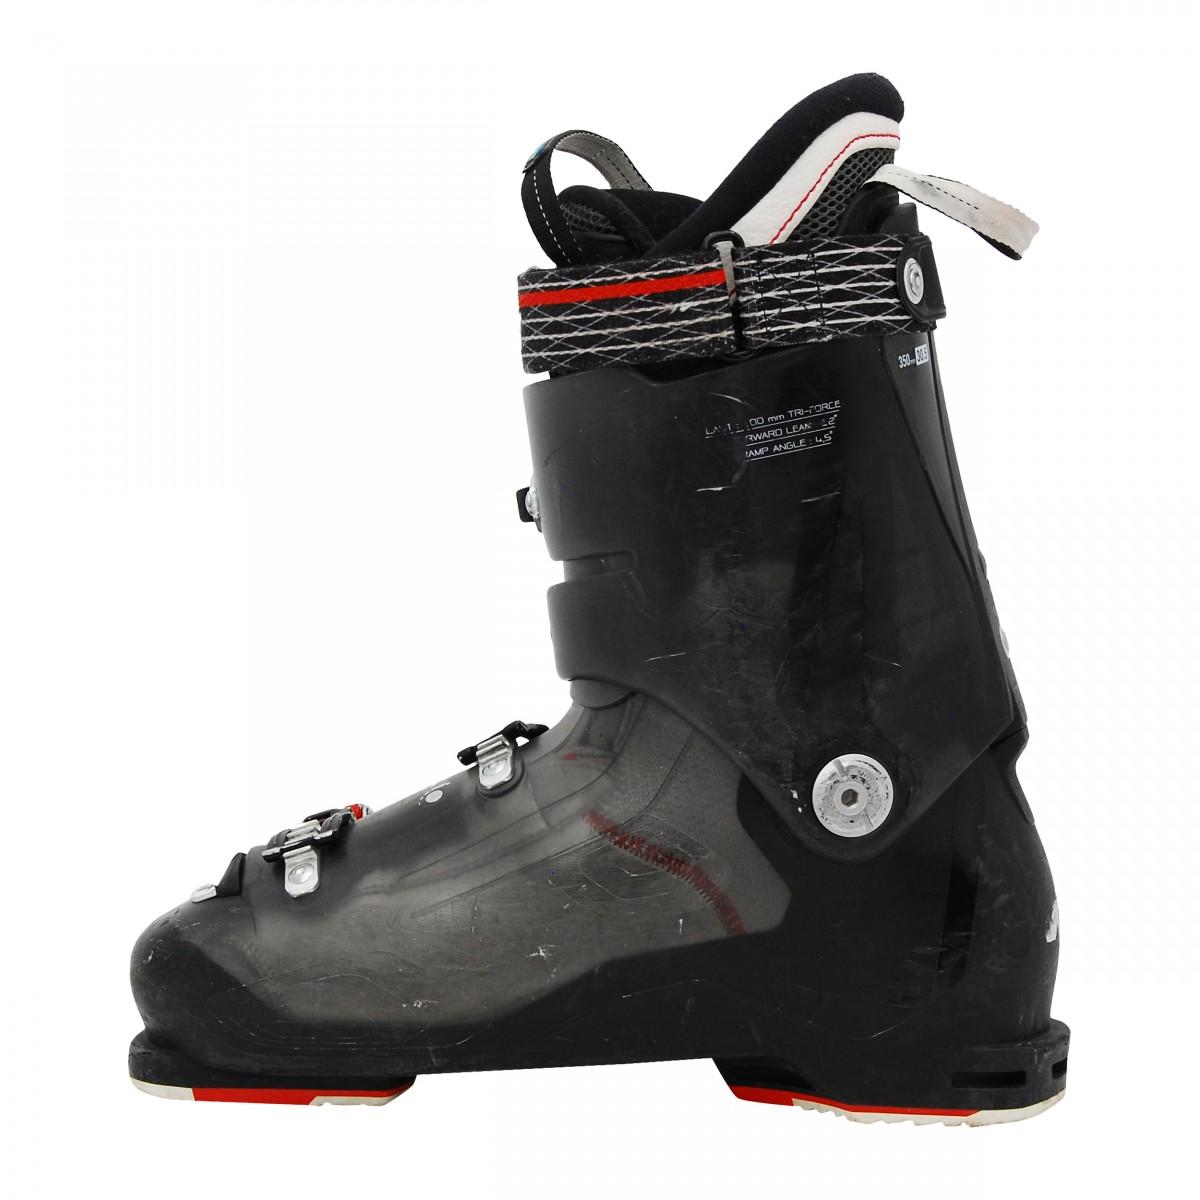 Chaussure-Ski-alpin-occasion-NORDICA-Speedmachine-110R-noir-rouge miniature 4